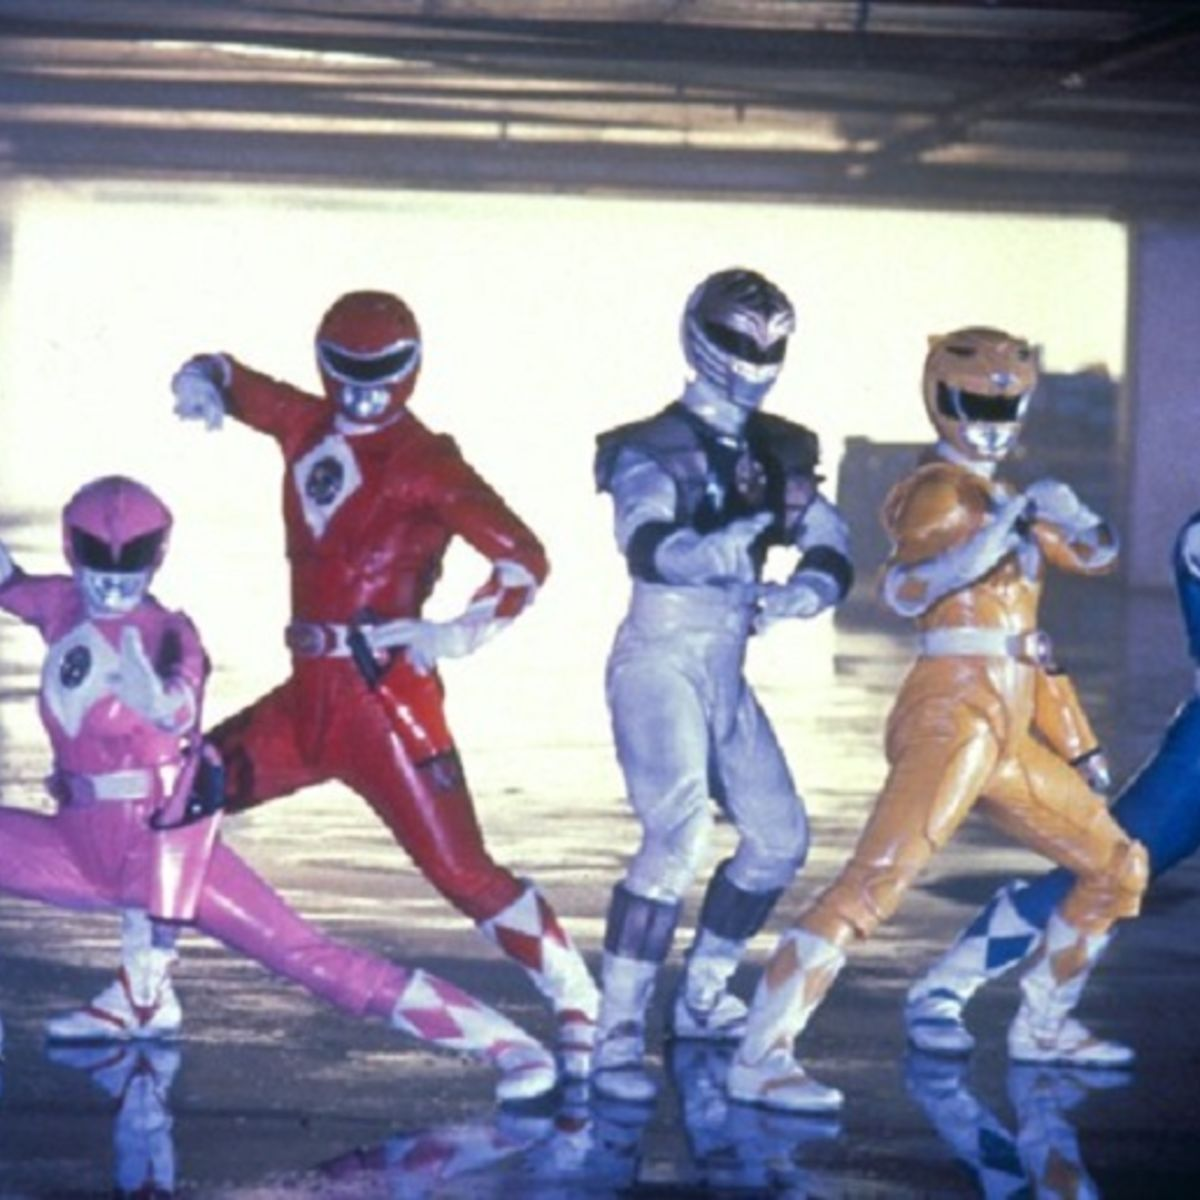 Mighty_Morphin_Power_Rangers_The_Movie_43044_Medium.jpg